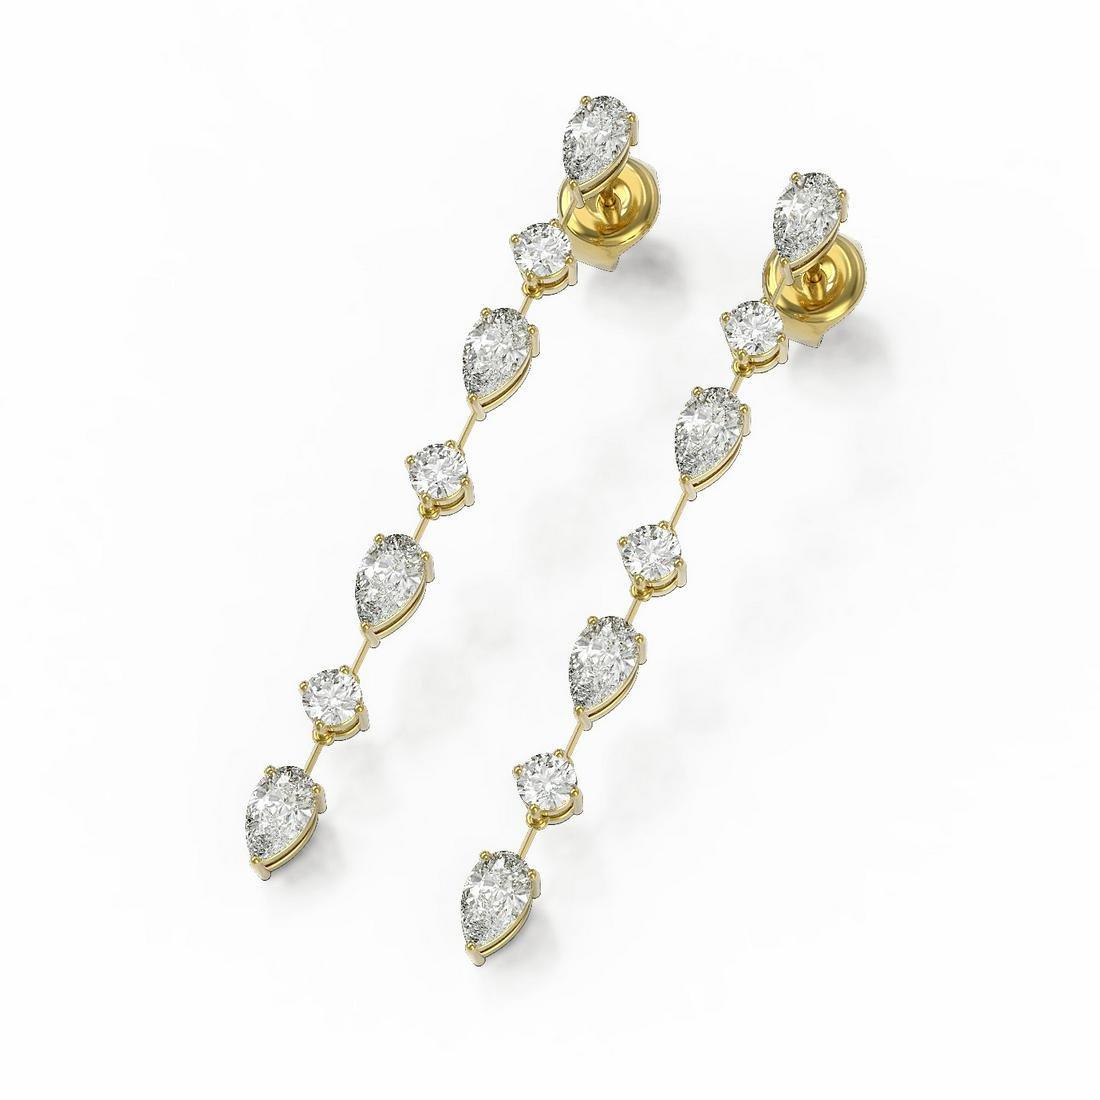 2.88 ctw Pear Cut Diamond Designer Earrings 18K Yellow